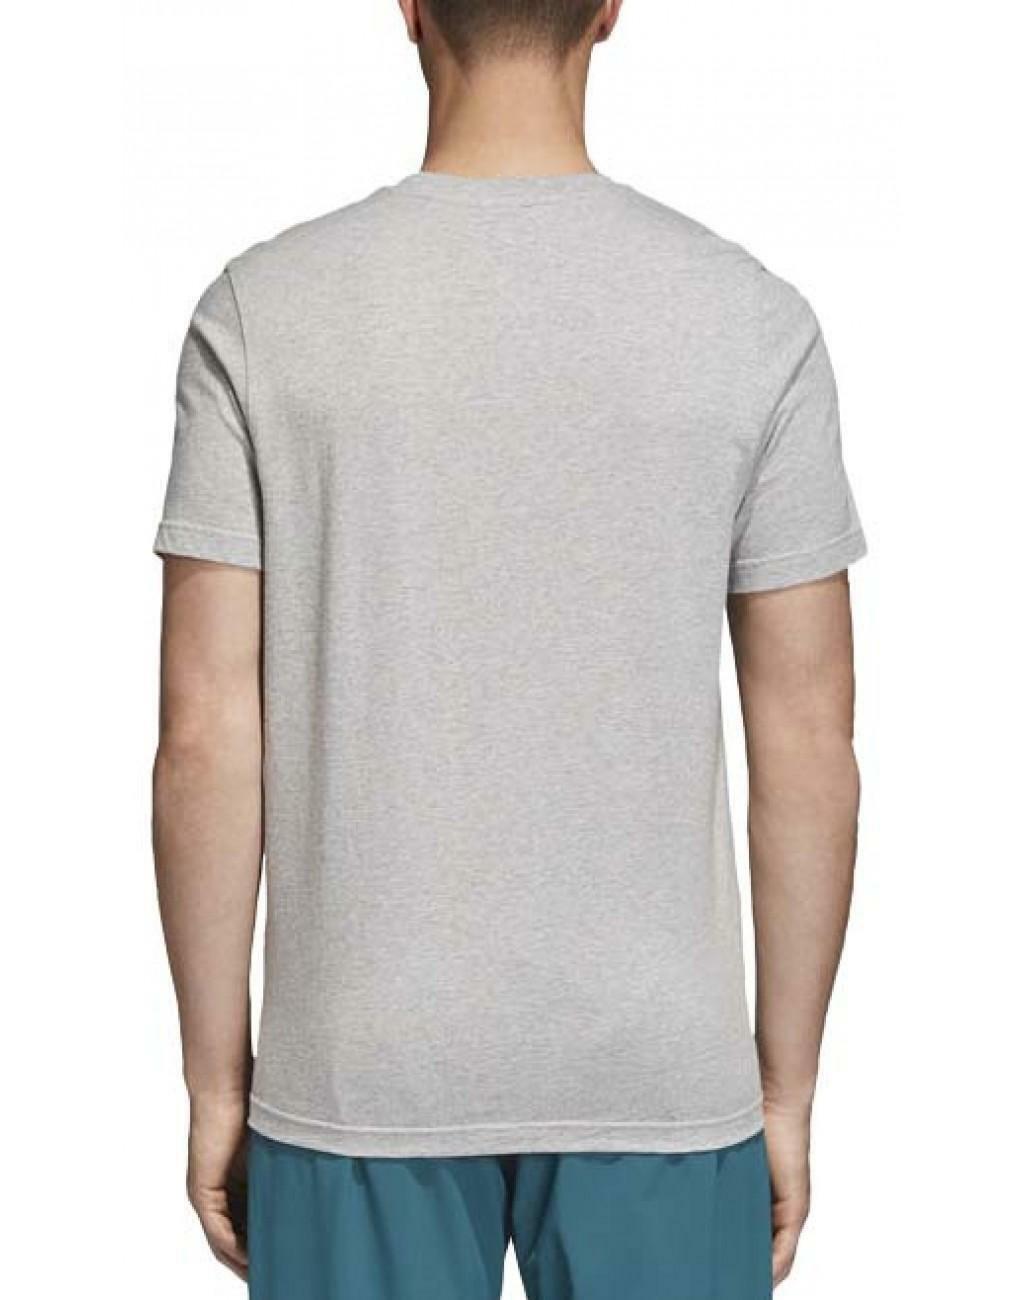 adidas adidas trefoil t-shirt uomo grigia